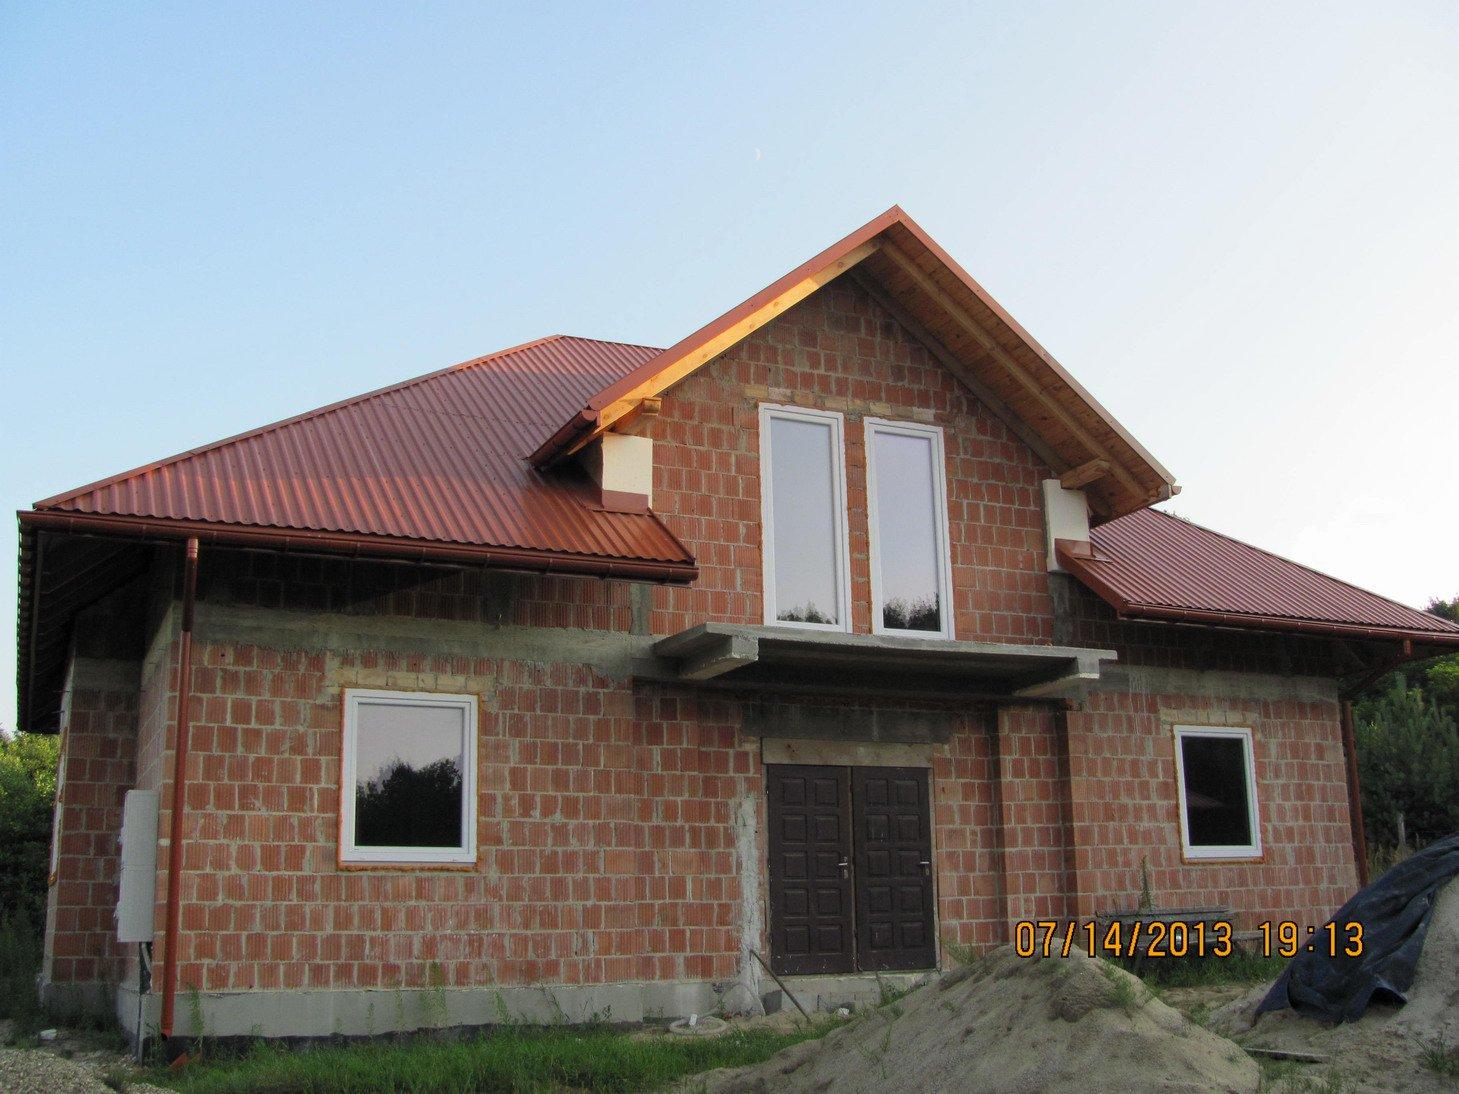 projekt-domu-filip-fot-5-1374839362-ouu15vxo.jpg